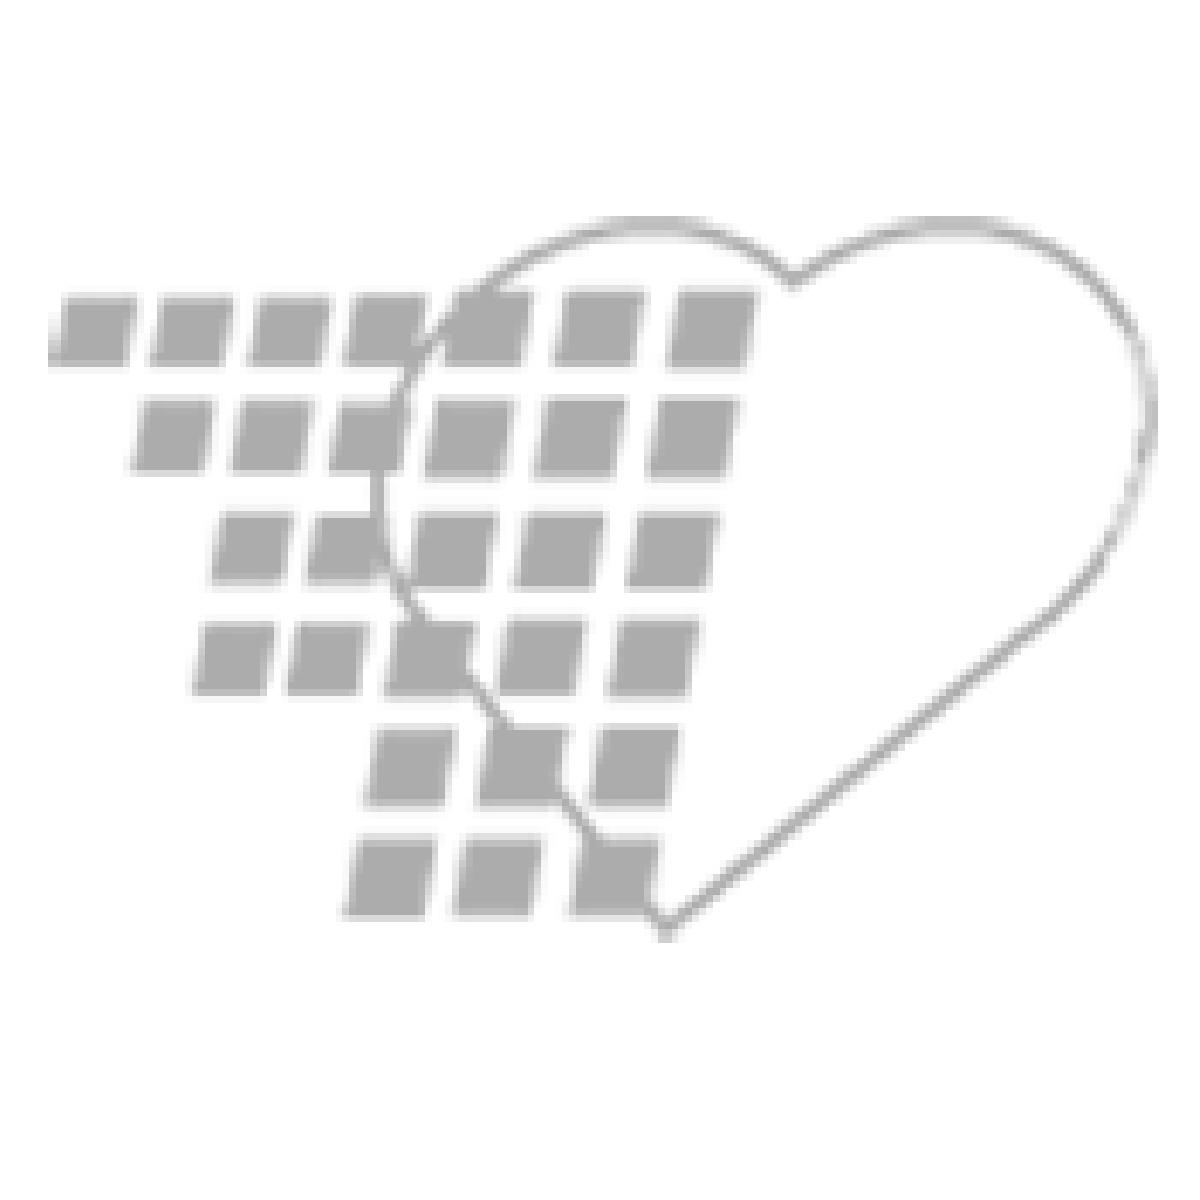 05 51 7200 Pocket NurseR Dressing Change Tray With ABD Pad